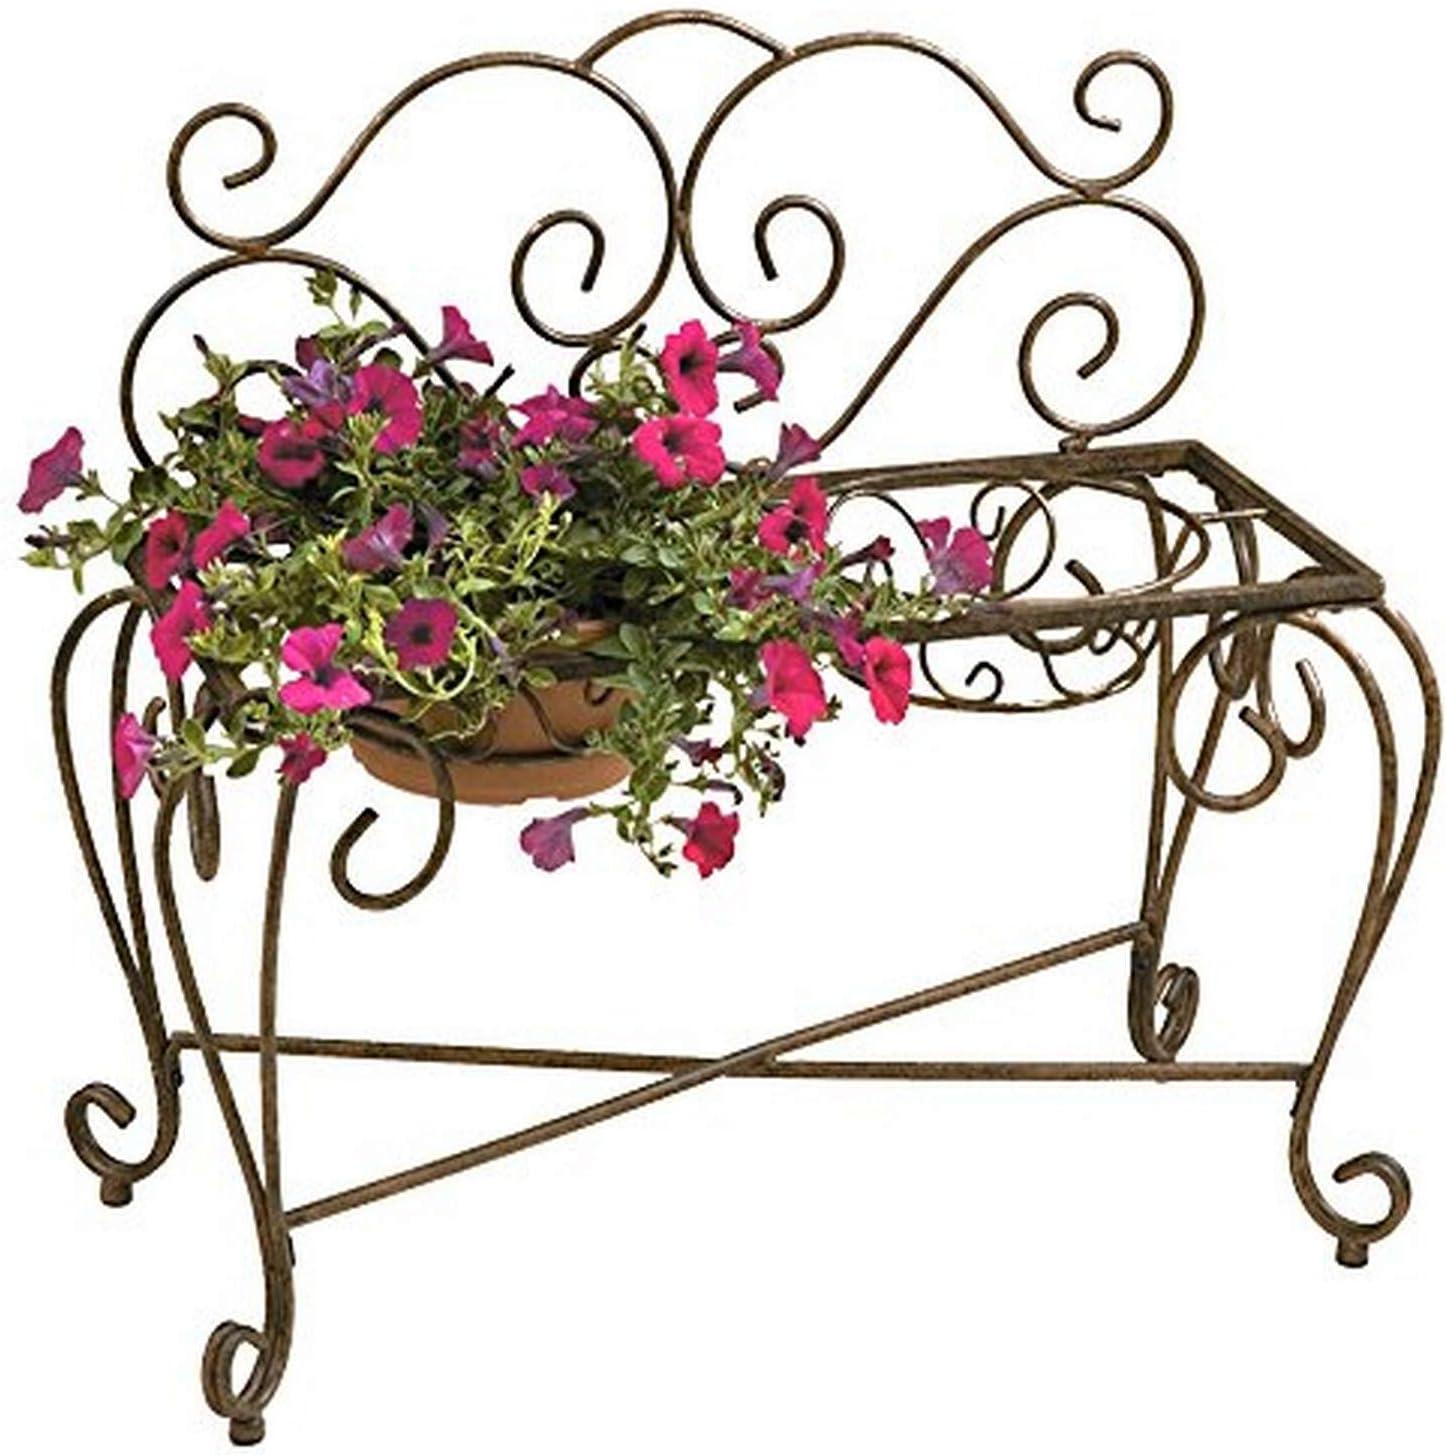 Deer Online limited product Park Ironworks BE203 Genuine 2 Pot Planter 3 Natural Patina Bench